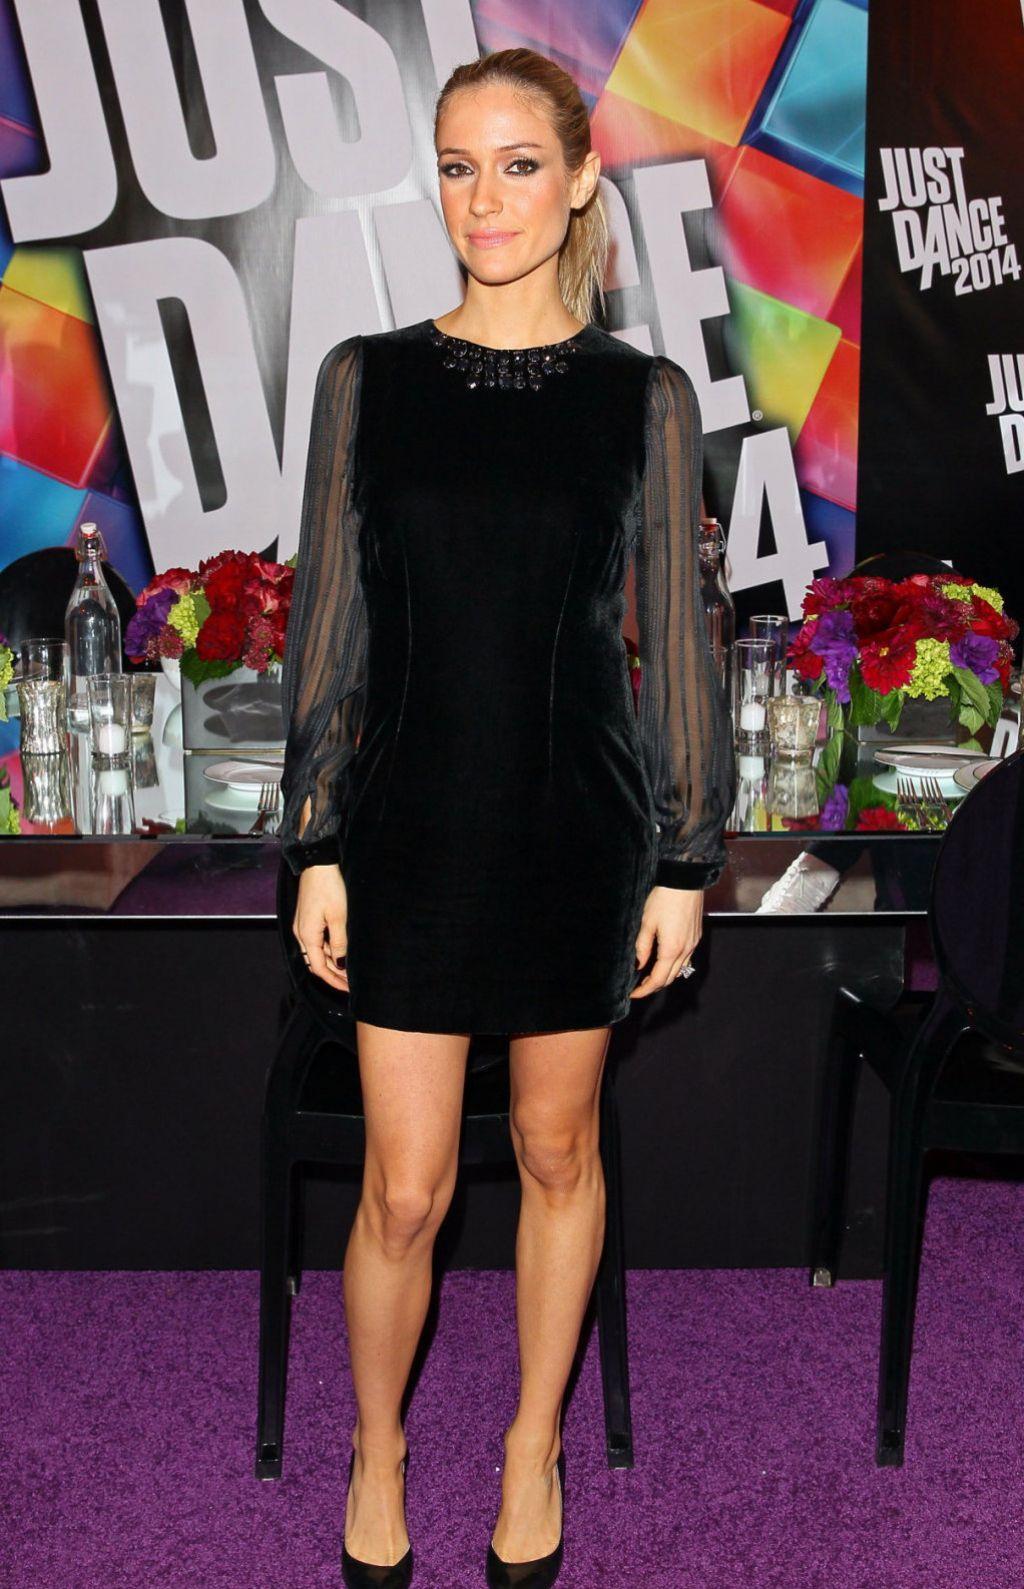 Kristin Cavallari at Ubisoft Game Just Dance 2014 Event in Hollywood